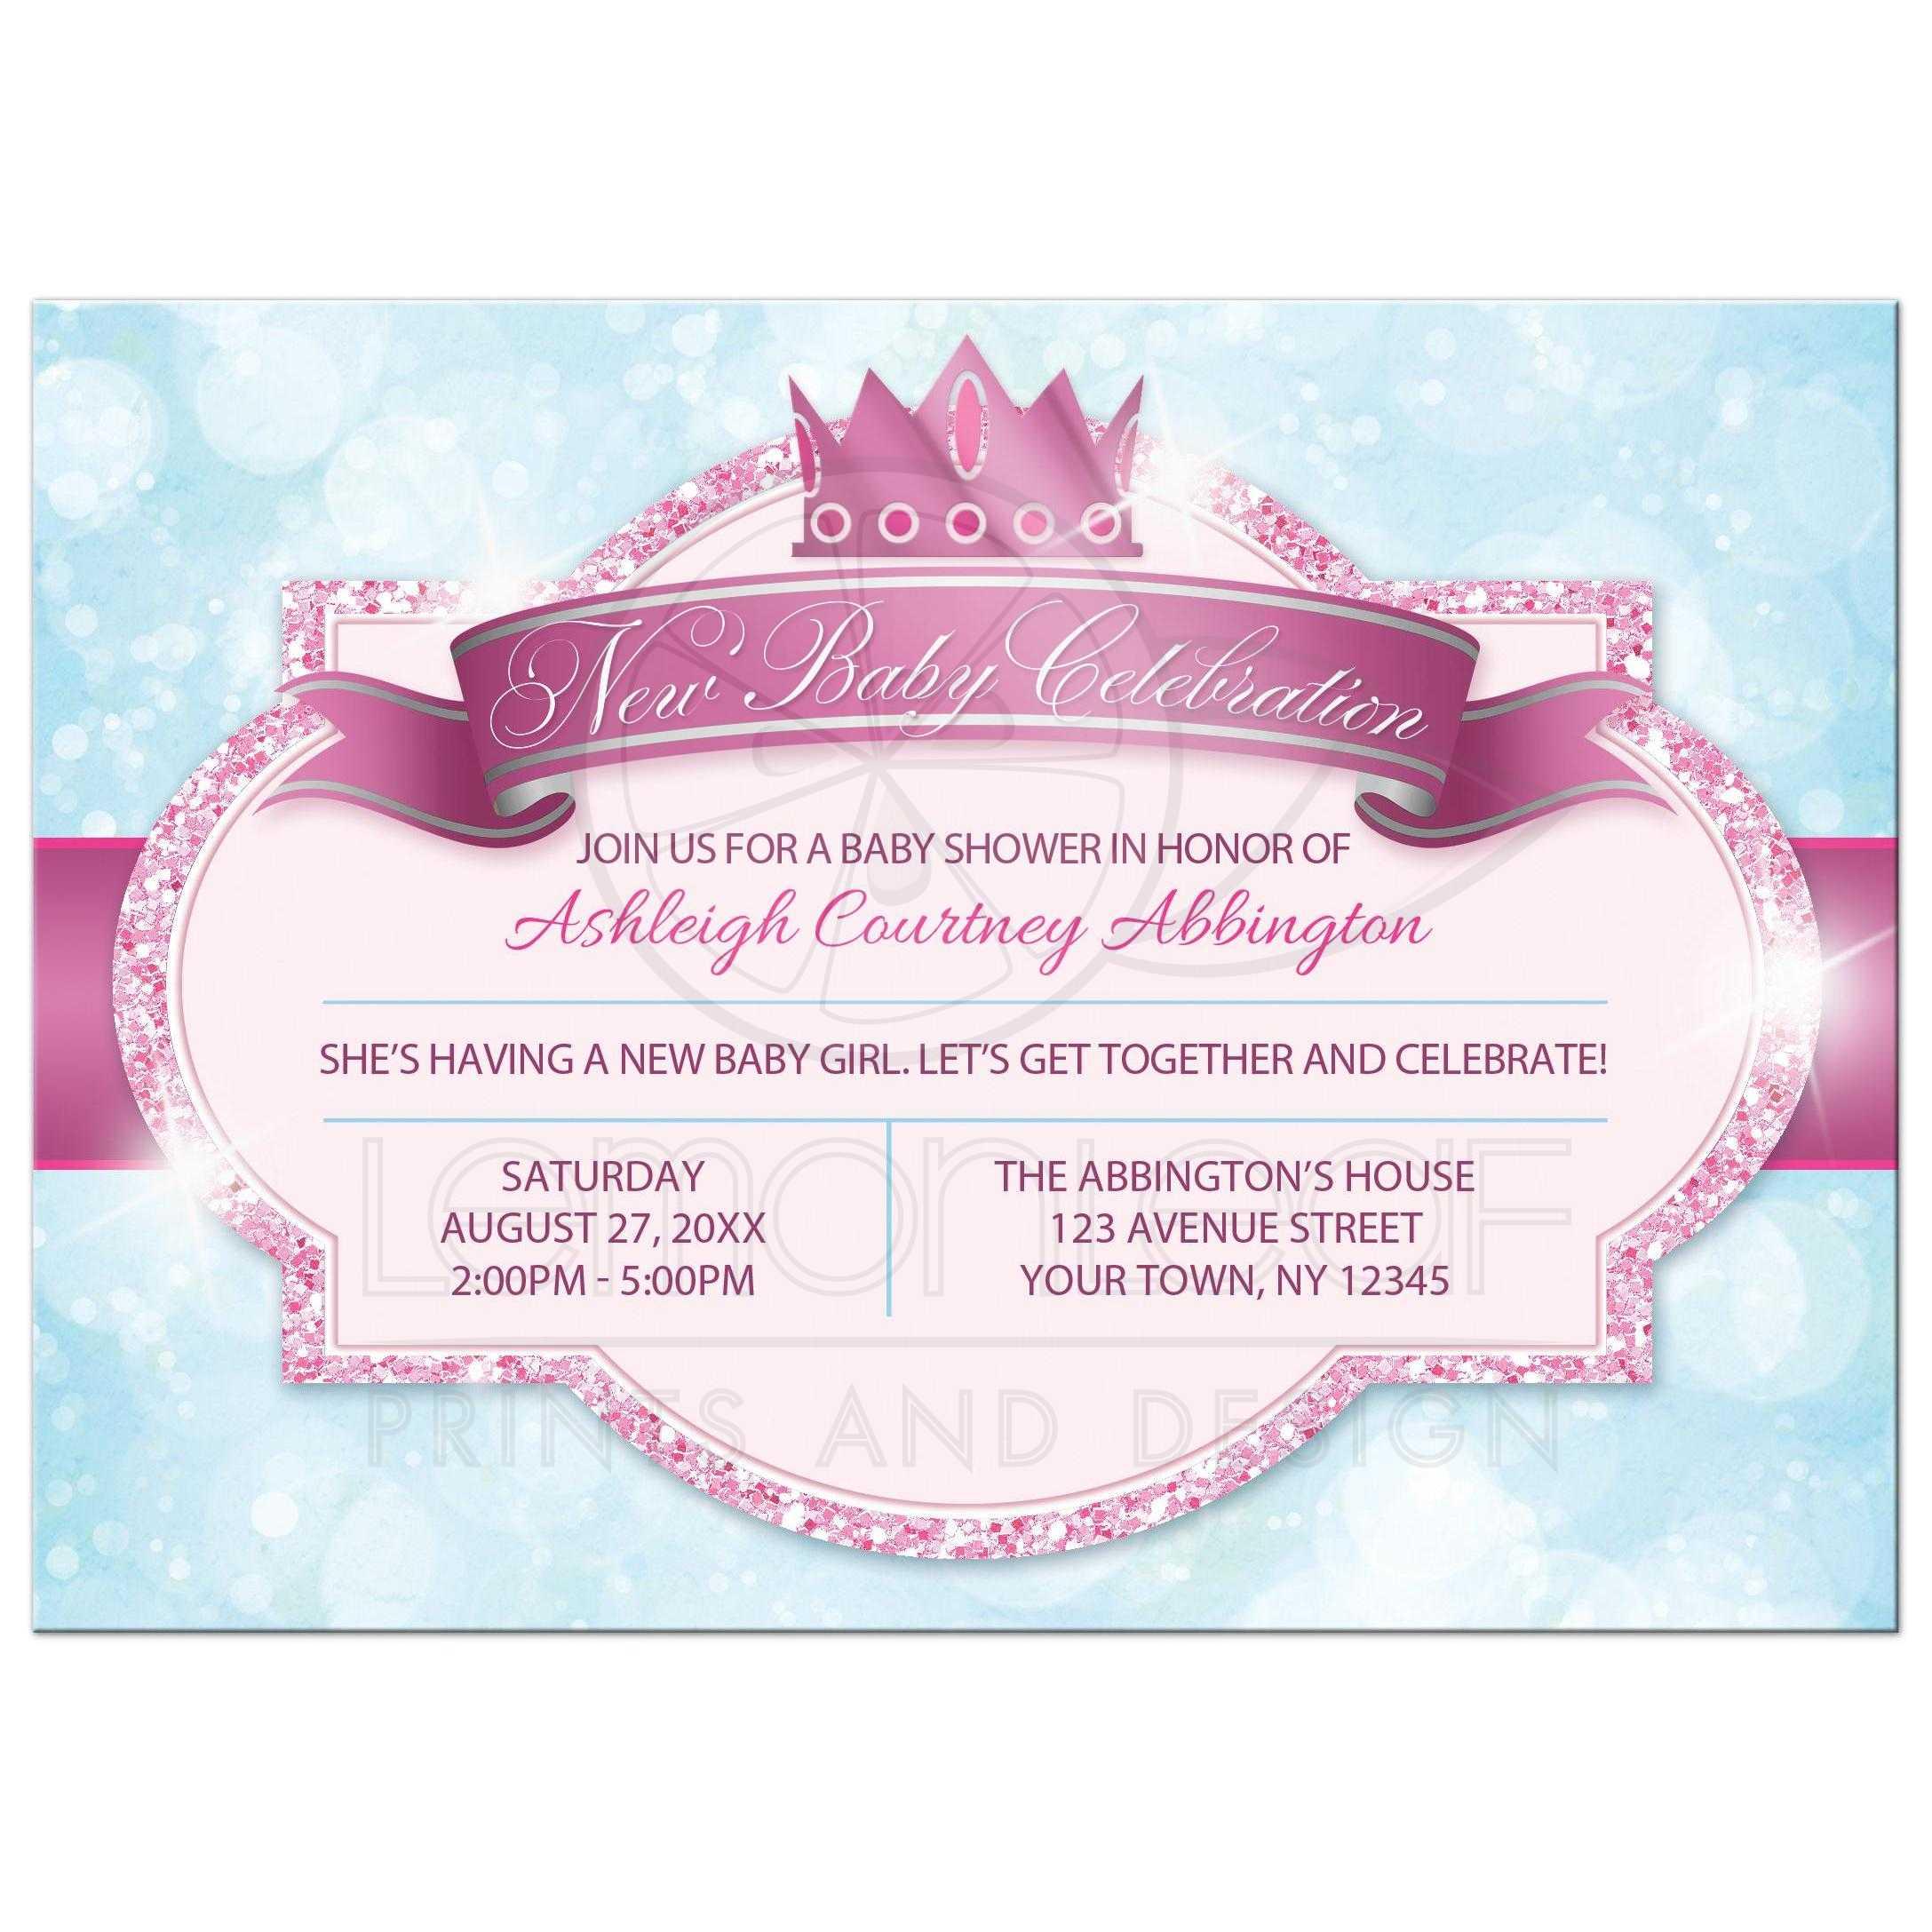 royal princess invitations - Ideal.vistalist.co